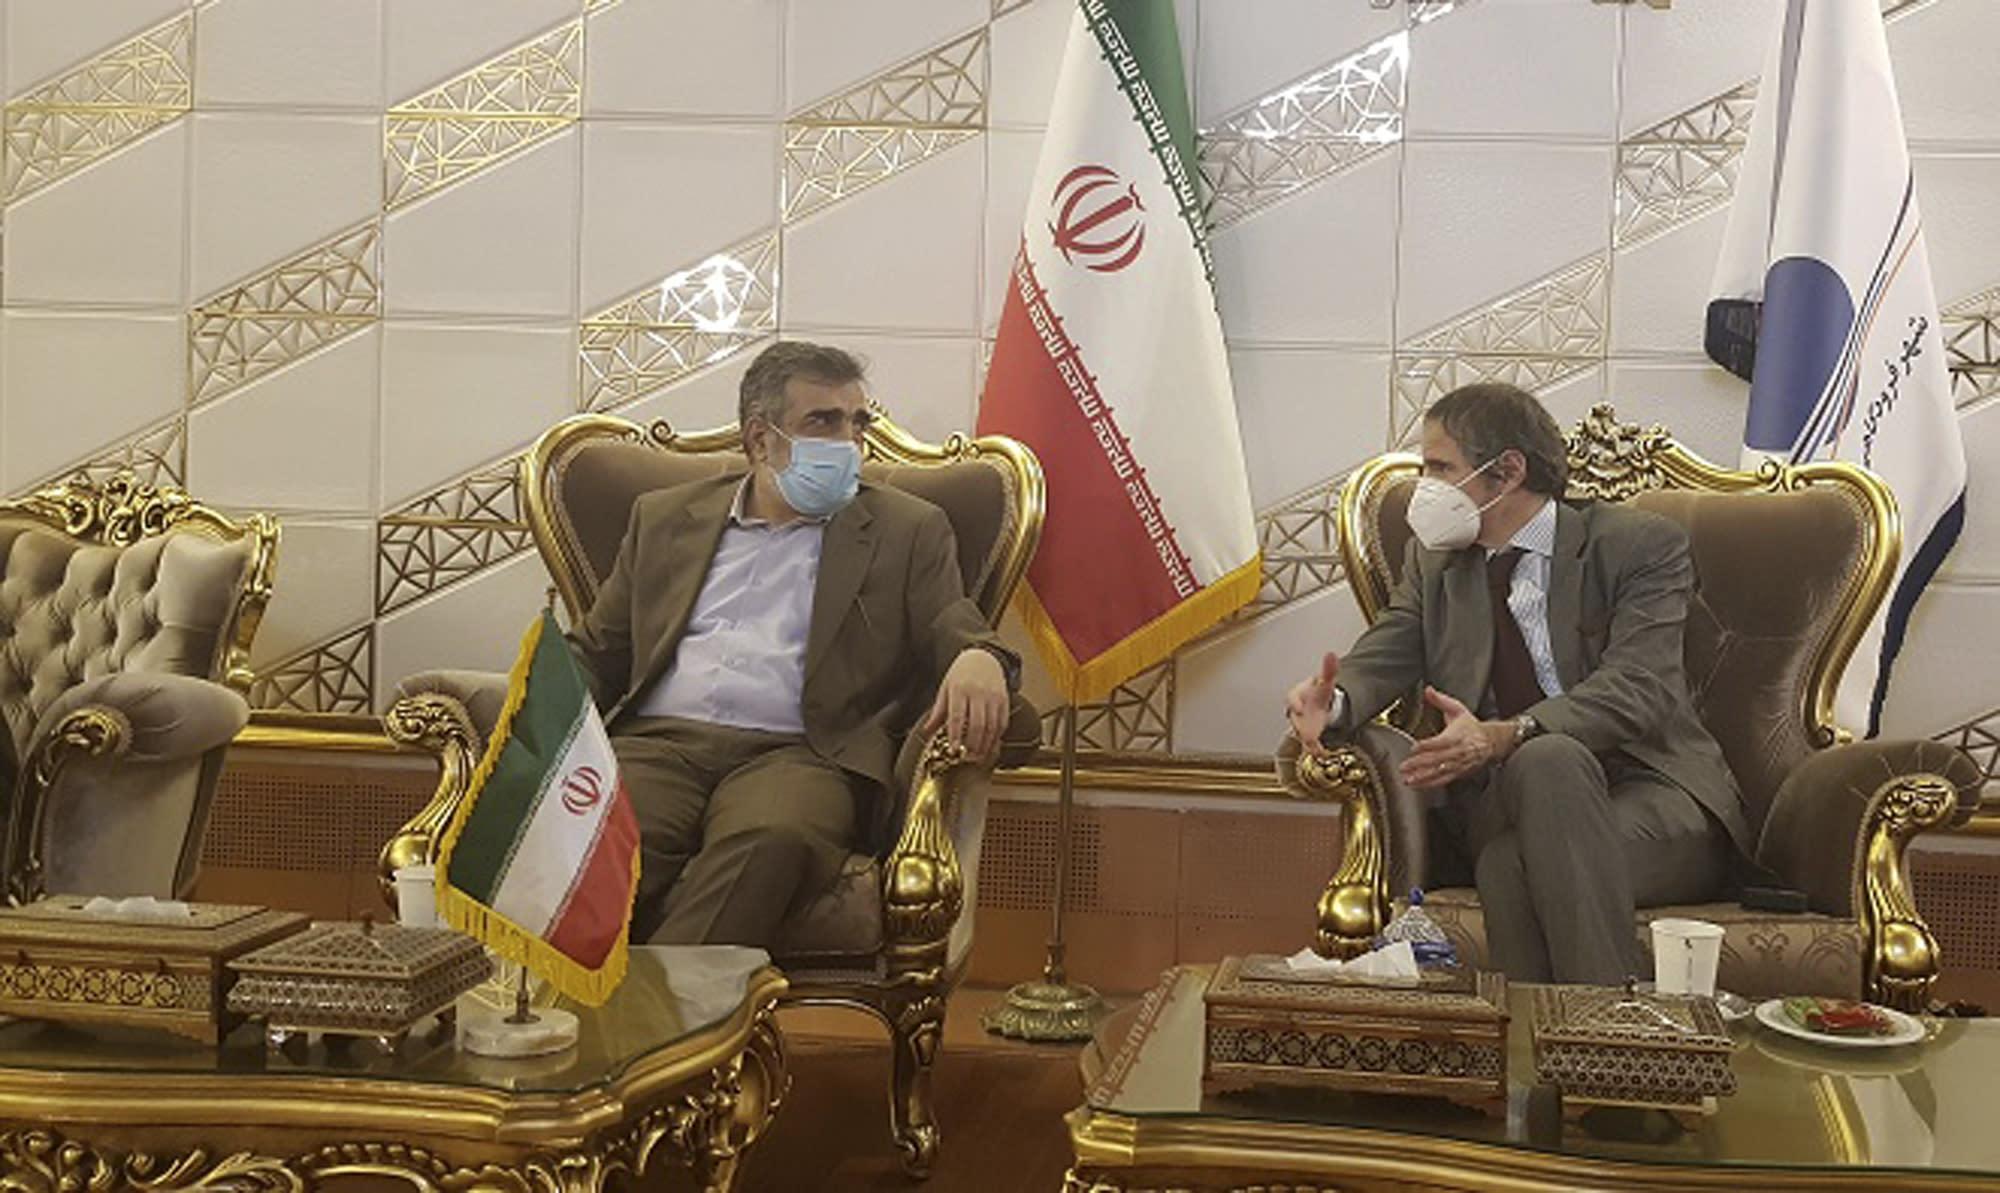 U.N. nuclear chief arrives in Iran ahead of deadline